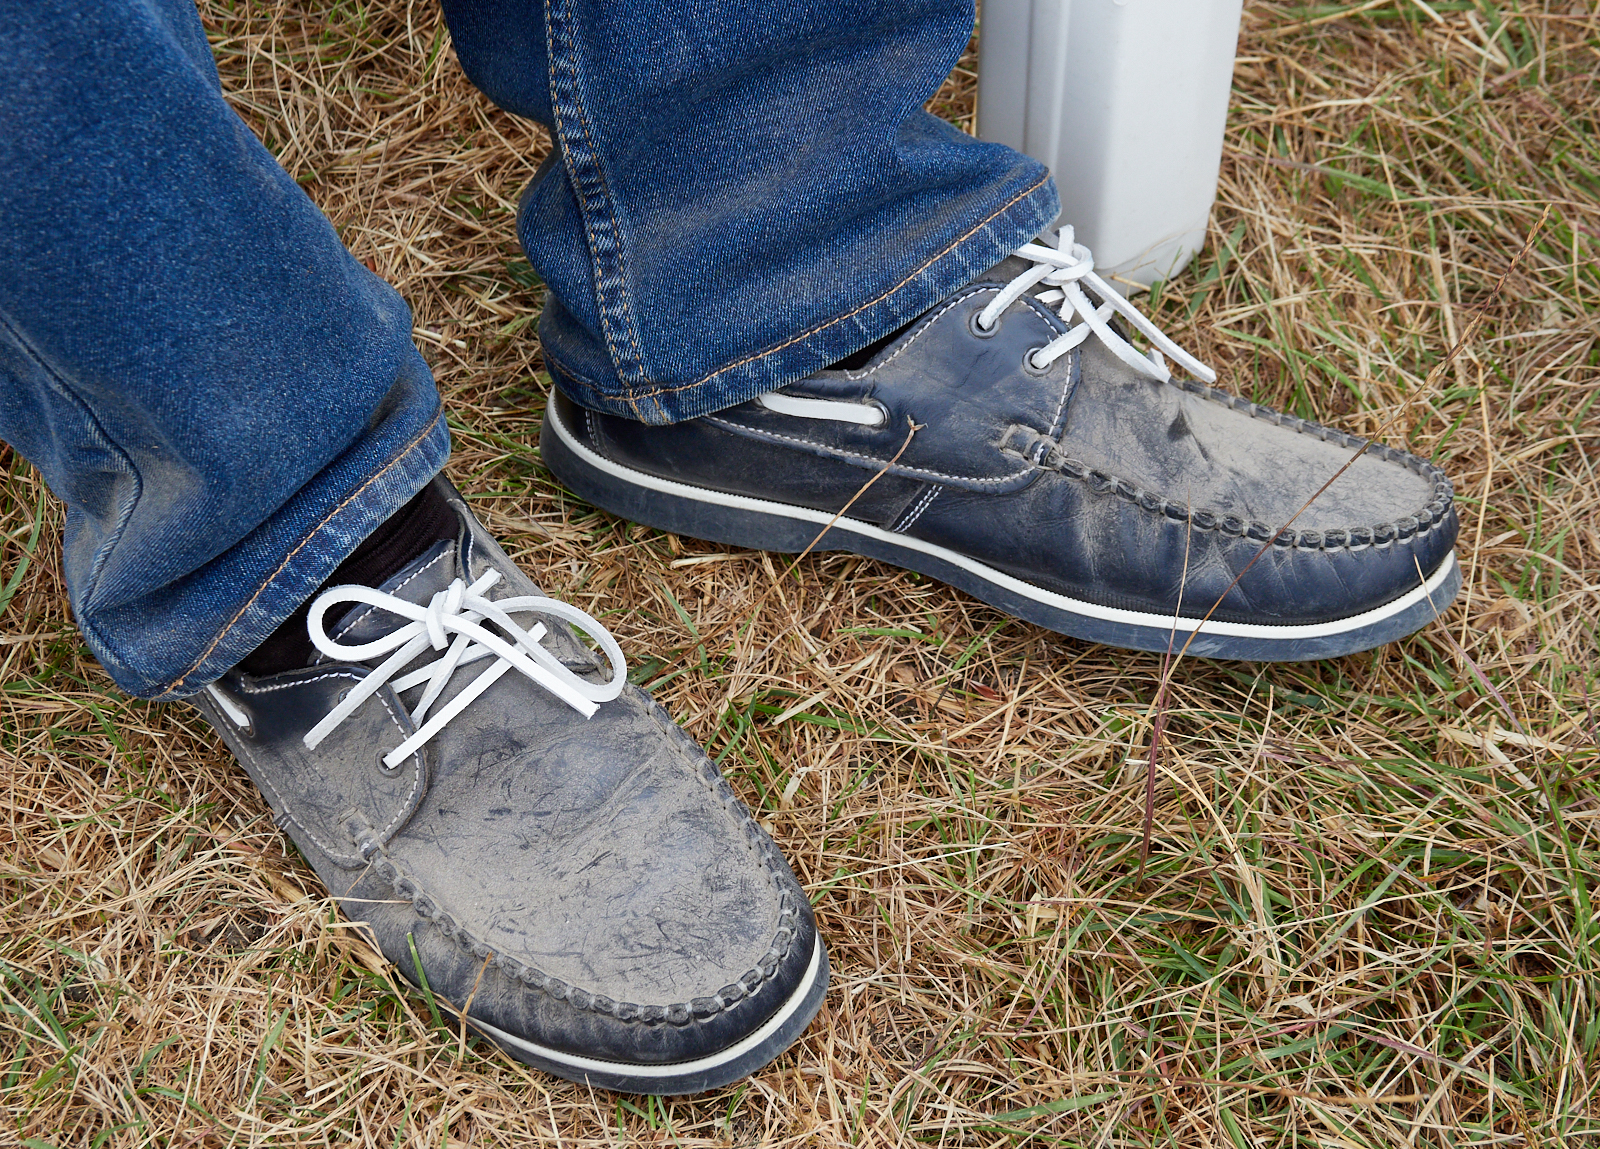 New shoes1600x1200 sRGB.jpg